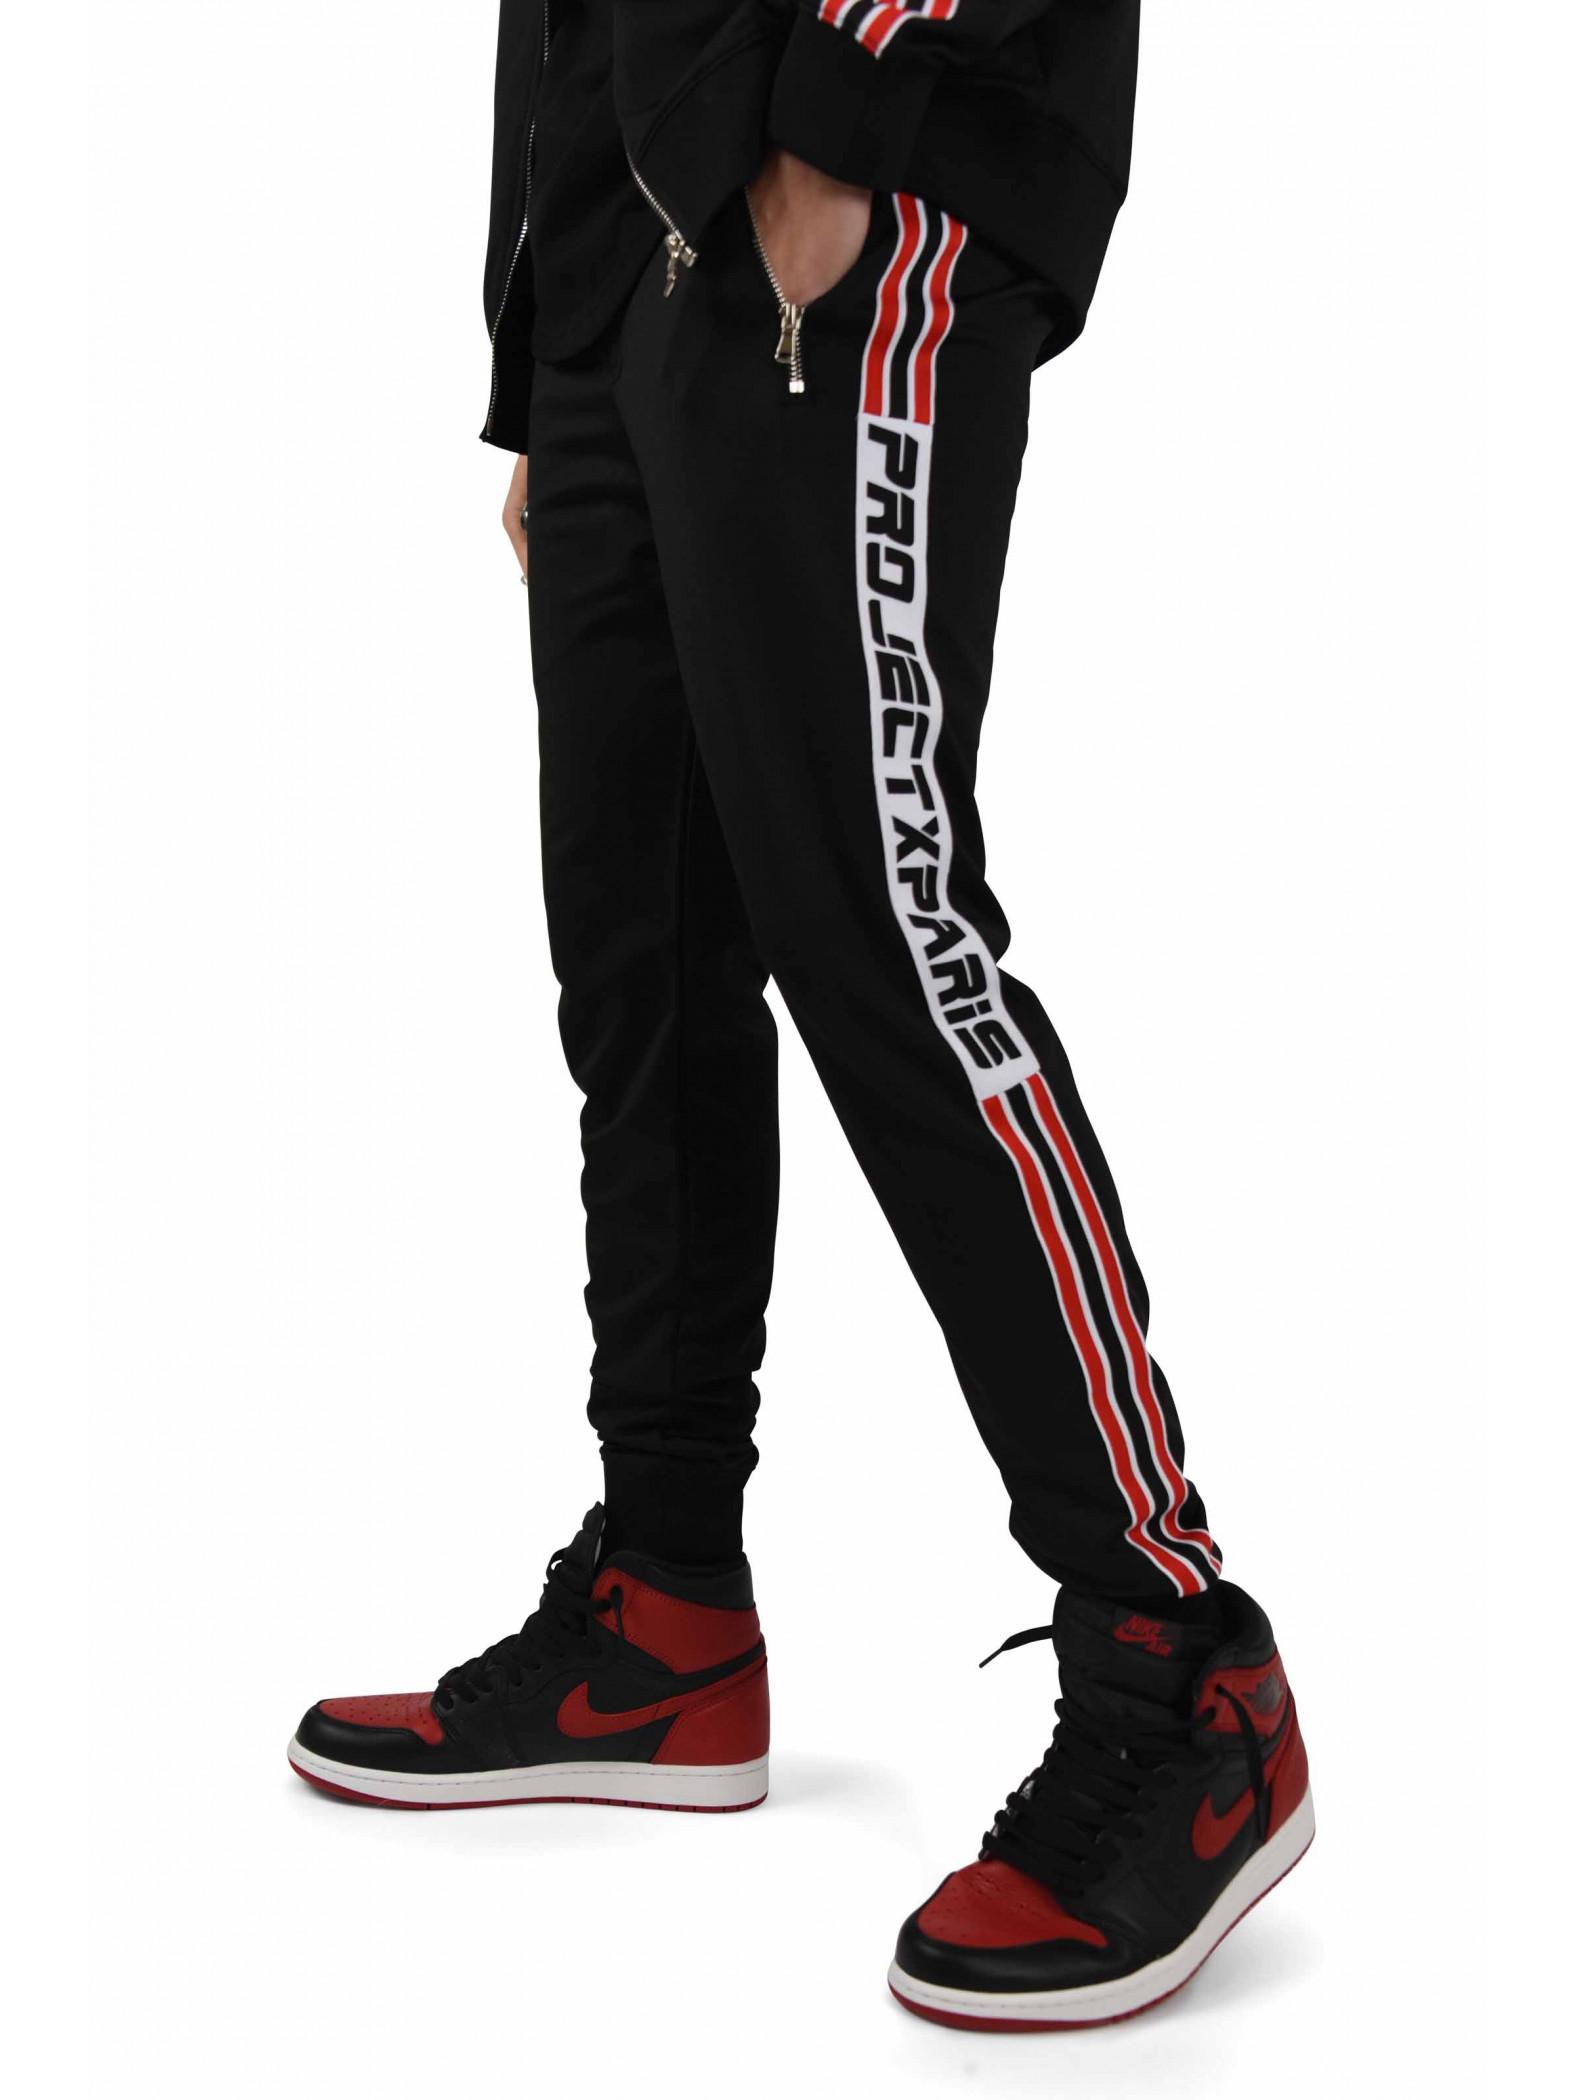 pantalon de jogging bandes racing homme project x paris. Black Bedroom Furniture Sets. Home Design Ideas